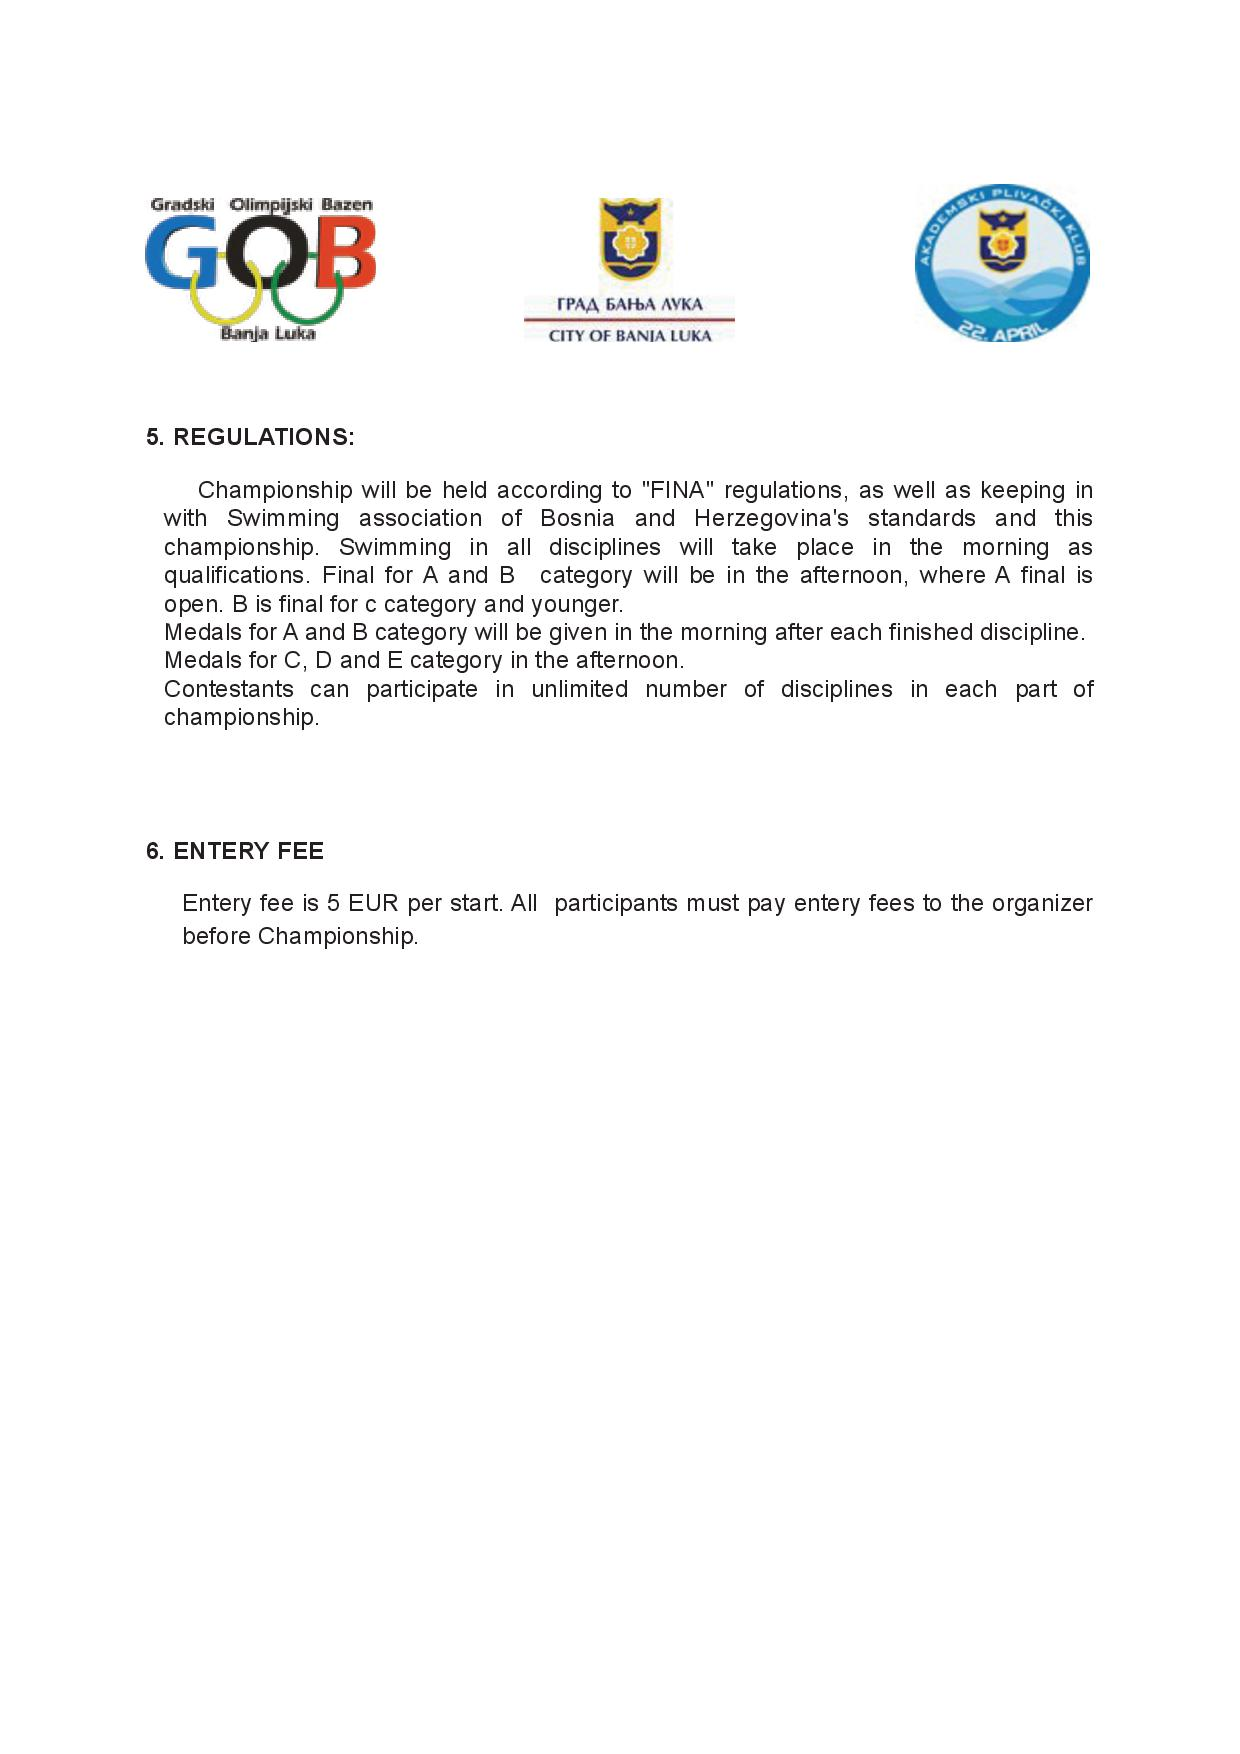 Original proposition of organizer, Page 3